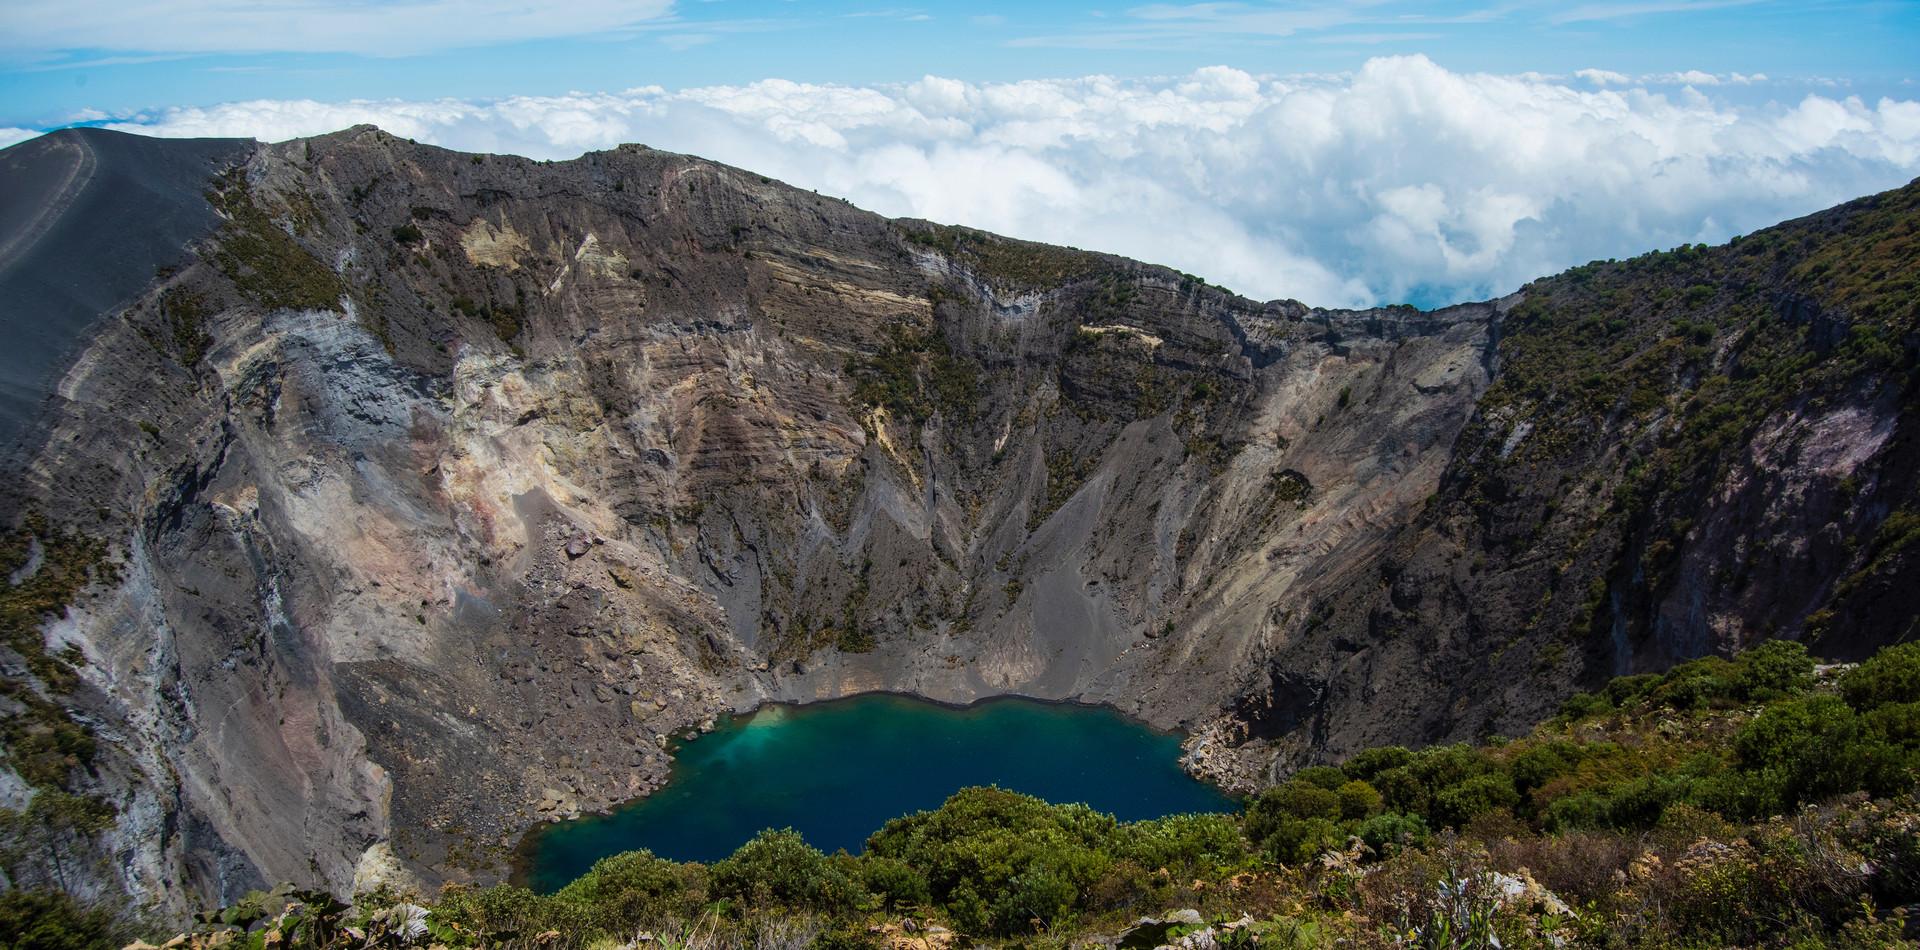 DAY 2 - Orosi / Irazú Volcano (± 3h RT.)